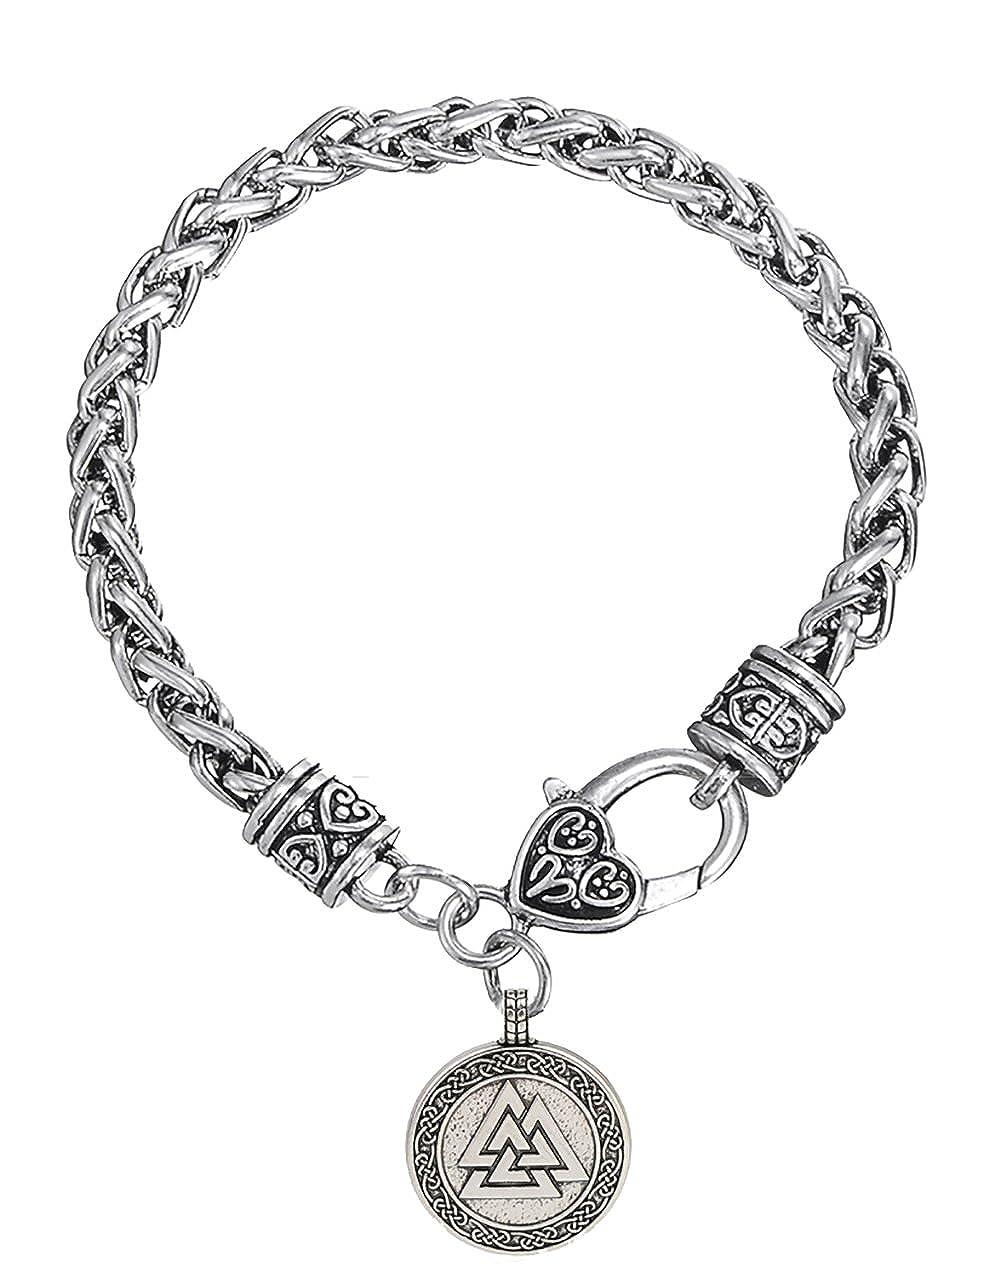 Dawapara Vintage Odin Vikings amuleto Valknut Grano Braccialetto per Uomo Donna Jewelry YiYou B07929G88W_US